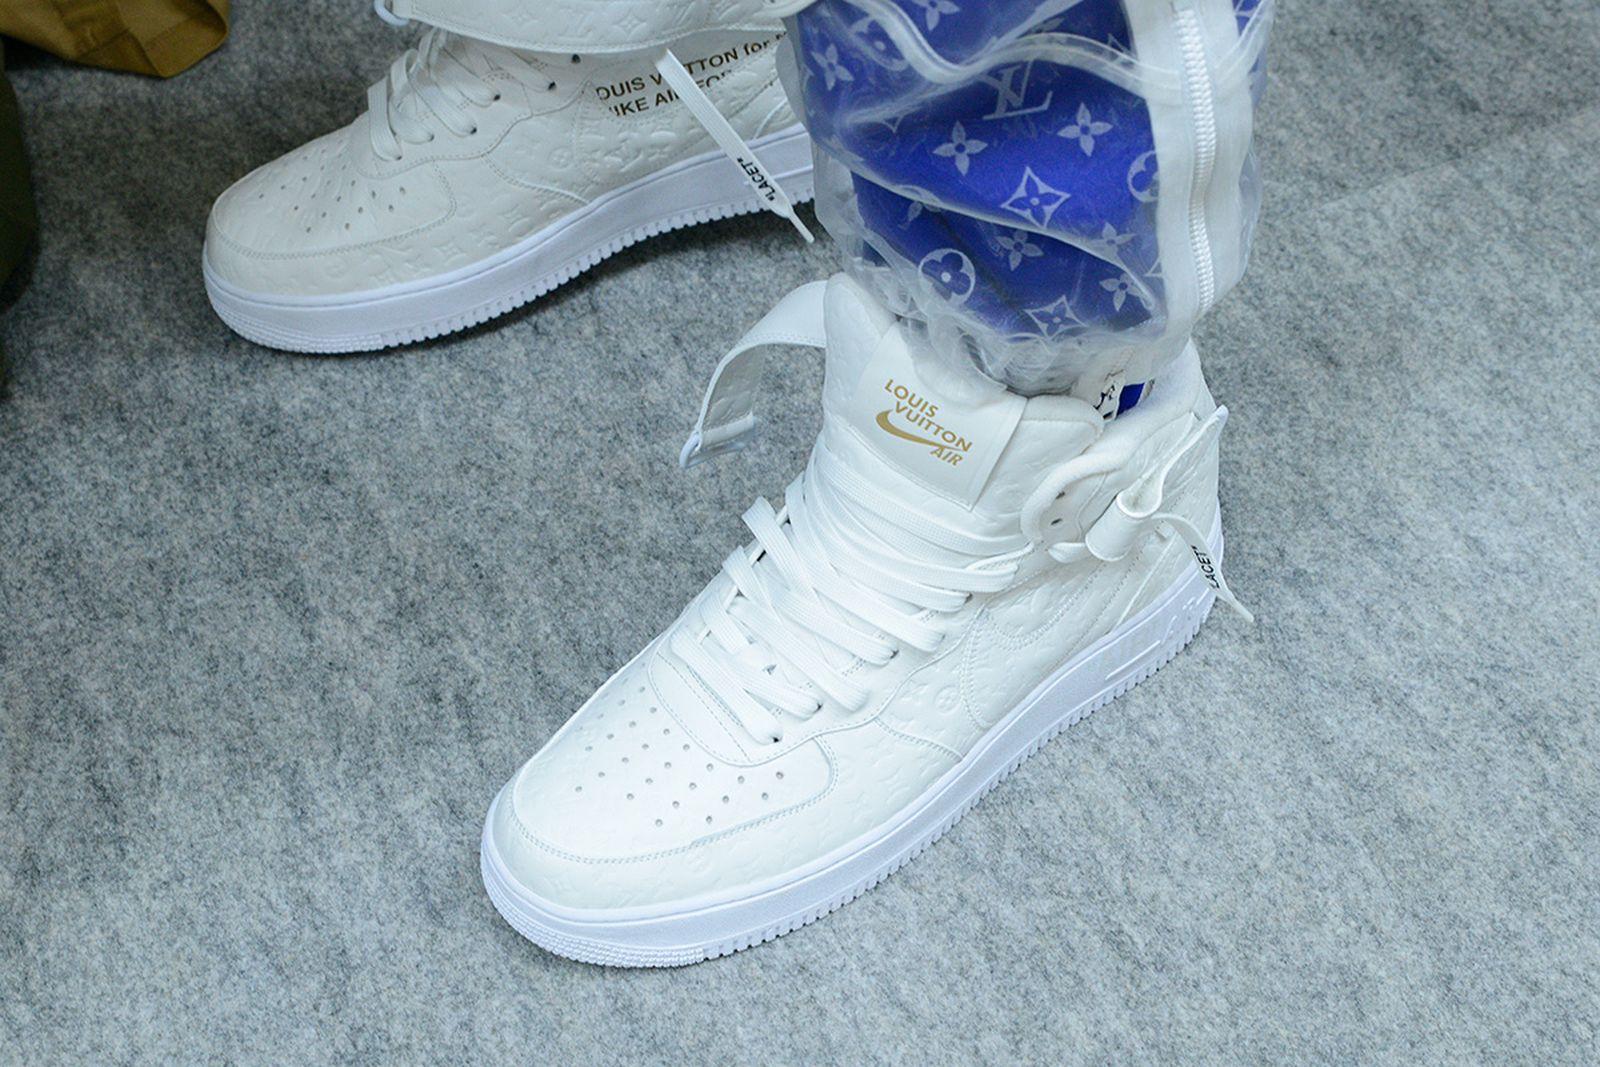 louis-vuitton-nike-virgil-abloh-sneaker-reveal-13